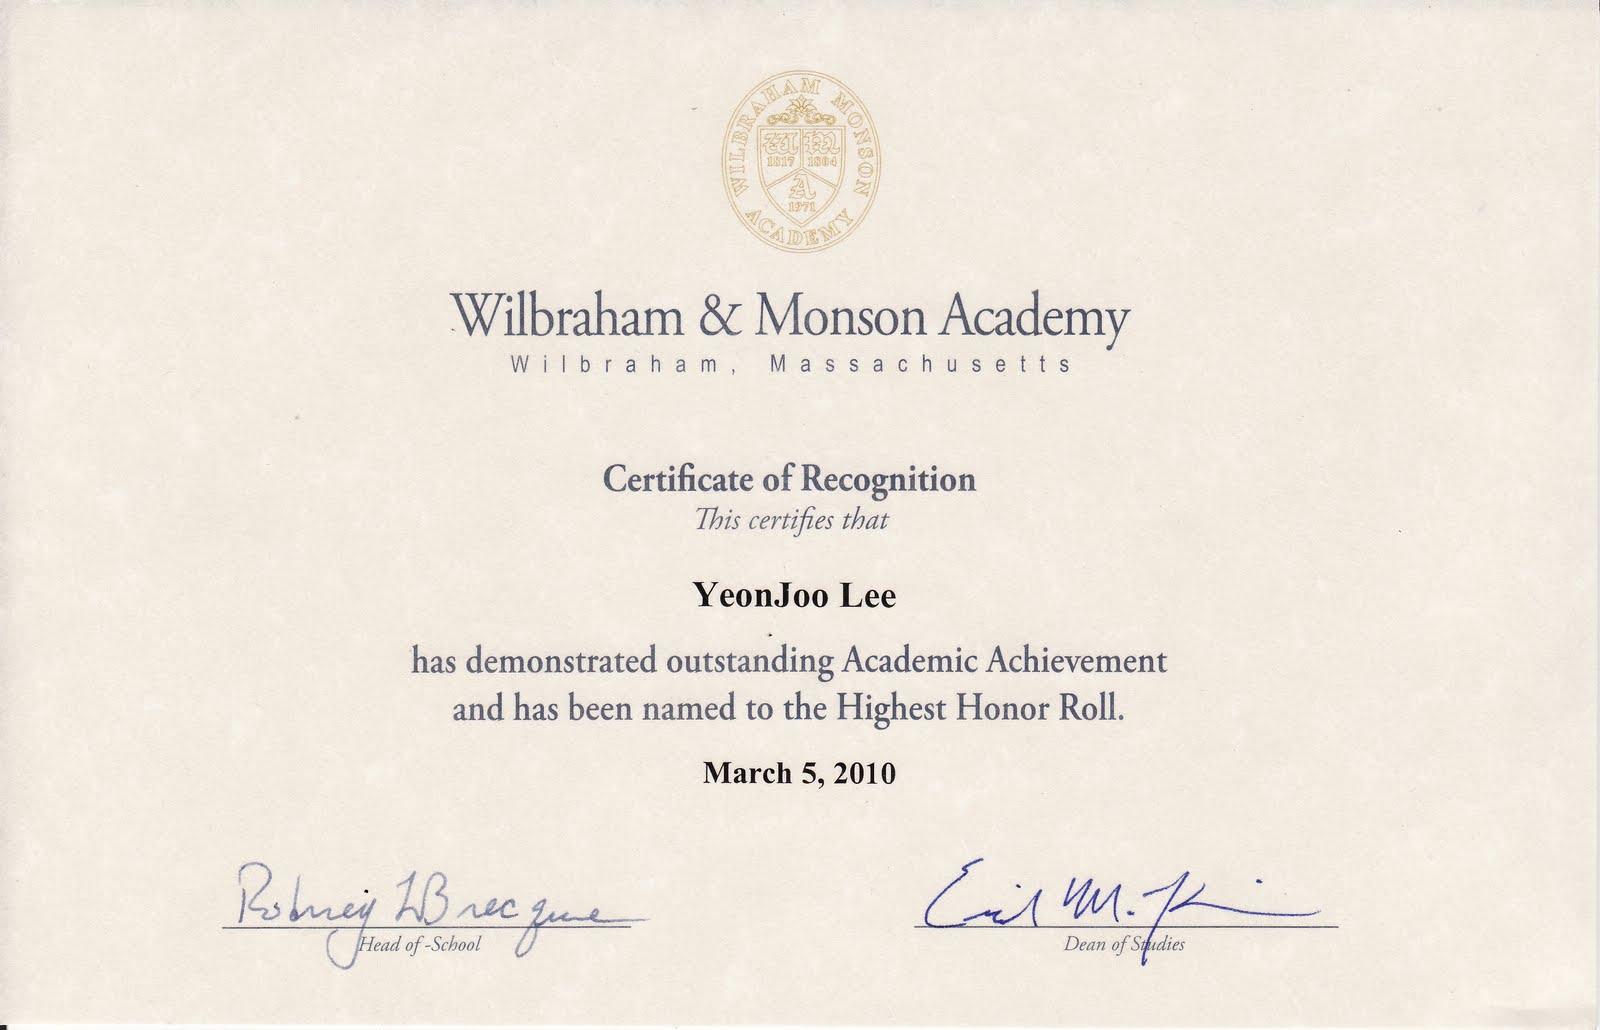 lee yeon joo academic achievement certificate 3 5 2010